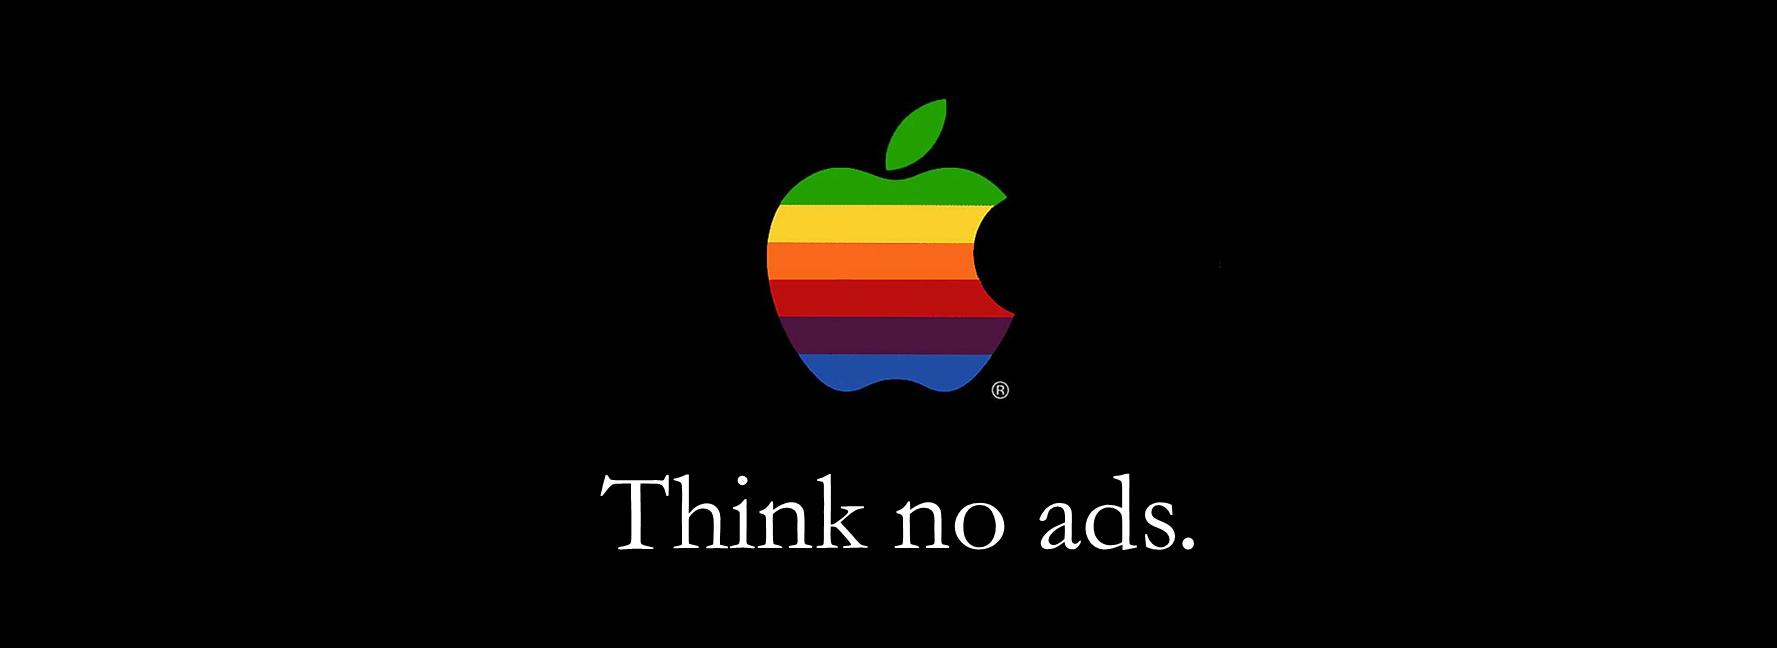 Ad Blockers on iOS9